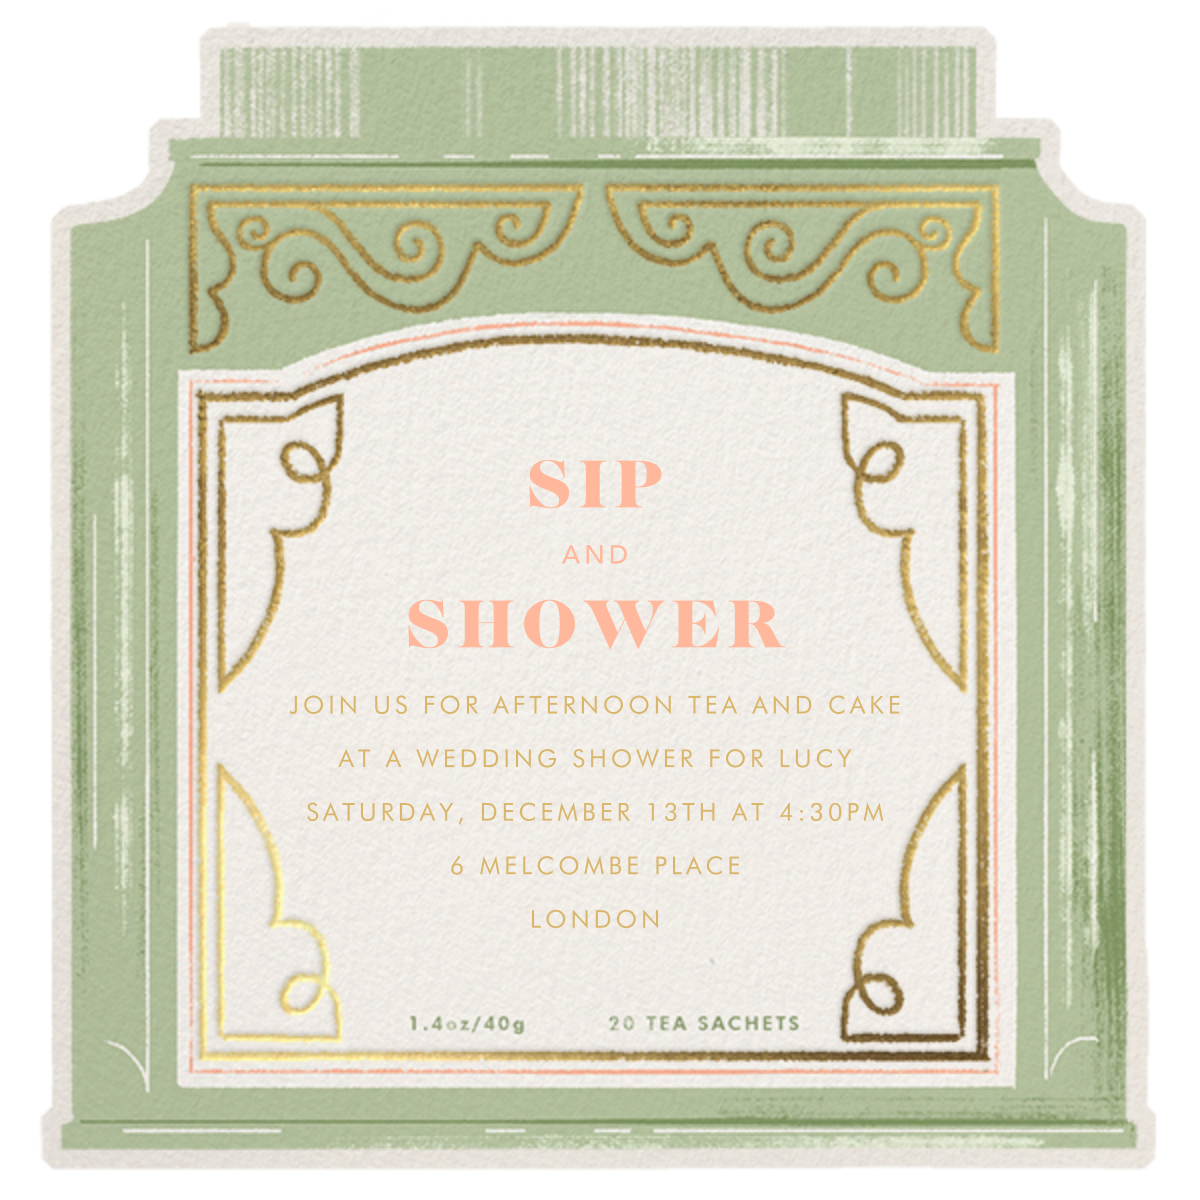 Sweet Tea - Paperless Post - Bridal shower